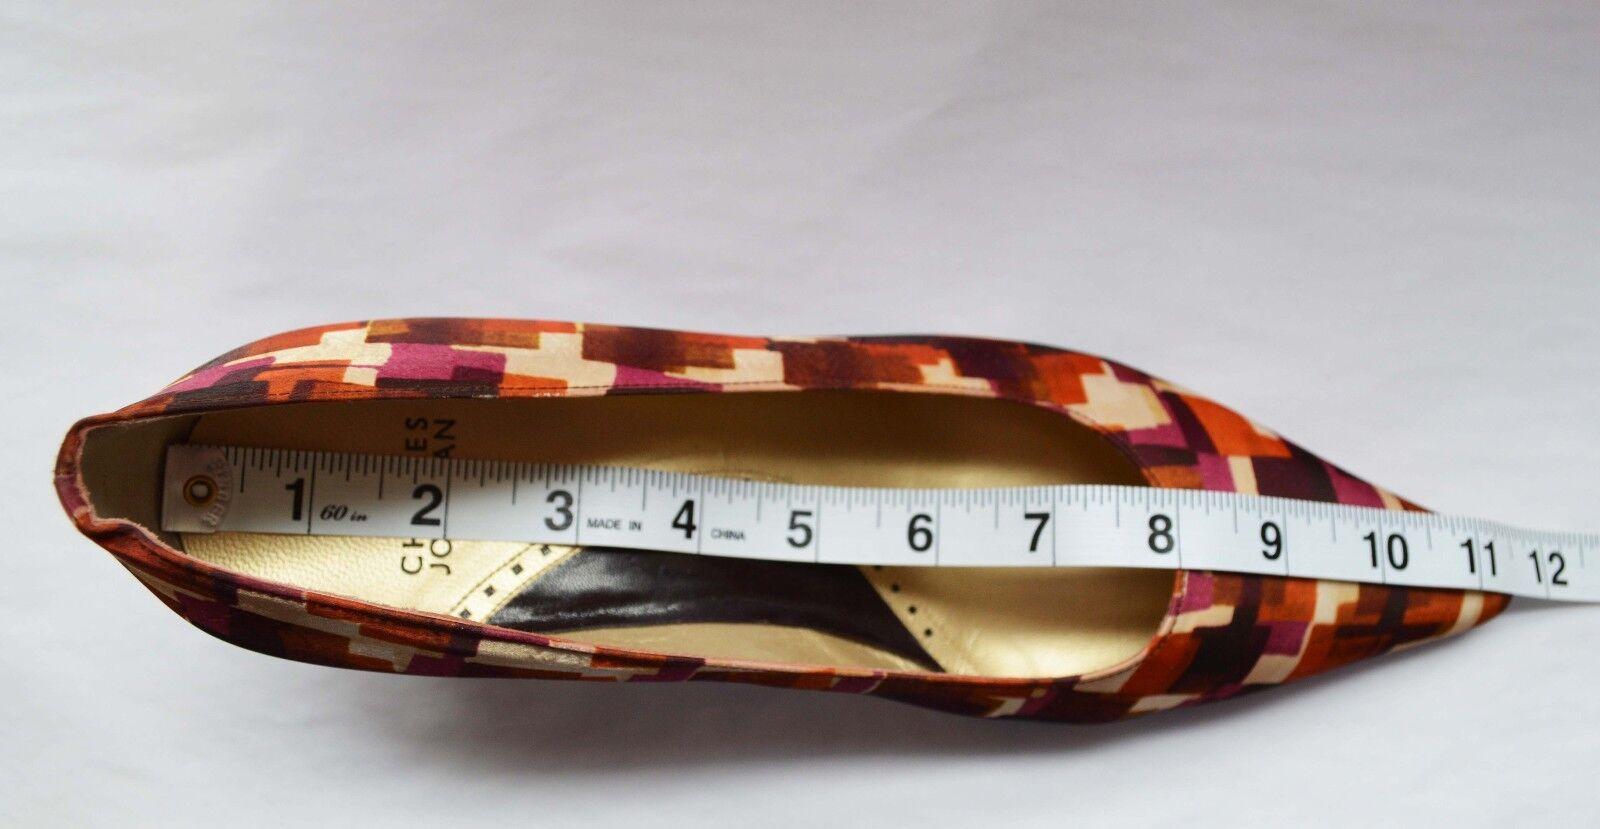 Charles Jourdan Pumps Silk Cubist Retro Rosa Kitten Rosa Retro Gold Größe 8.5 damen schuhe b8e664